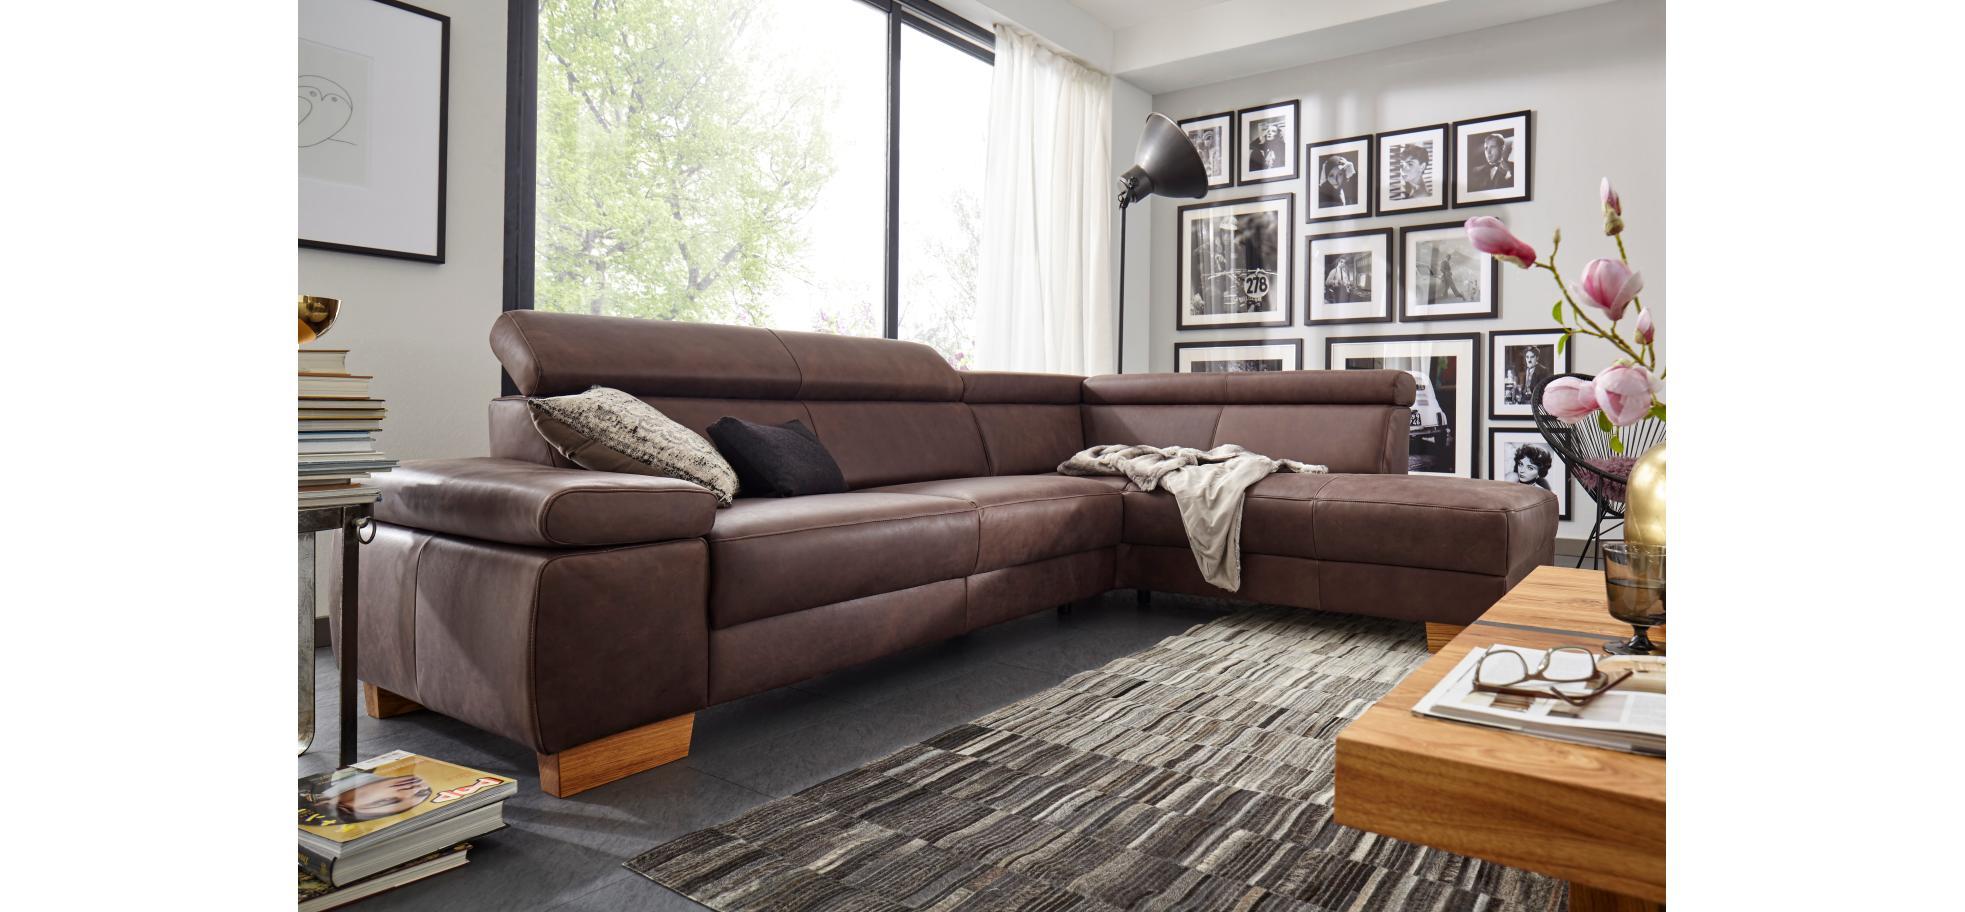 hochwertiges lederecksofa mit sitztiefenverstellung natura philadelphia m belhaus pohl. Black Bedroom Furniture Sets. Home Design Ideas